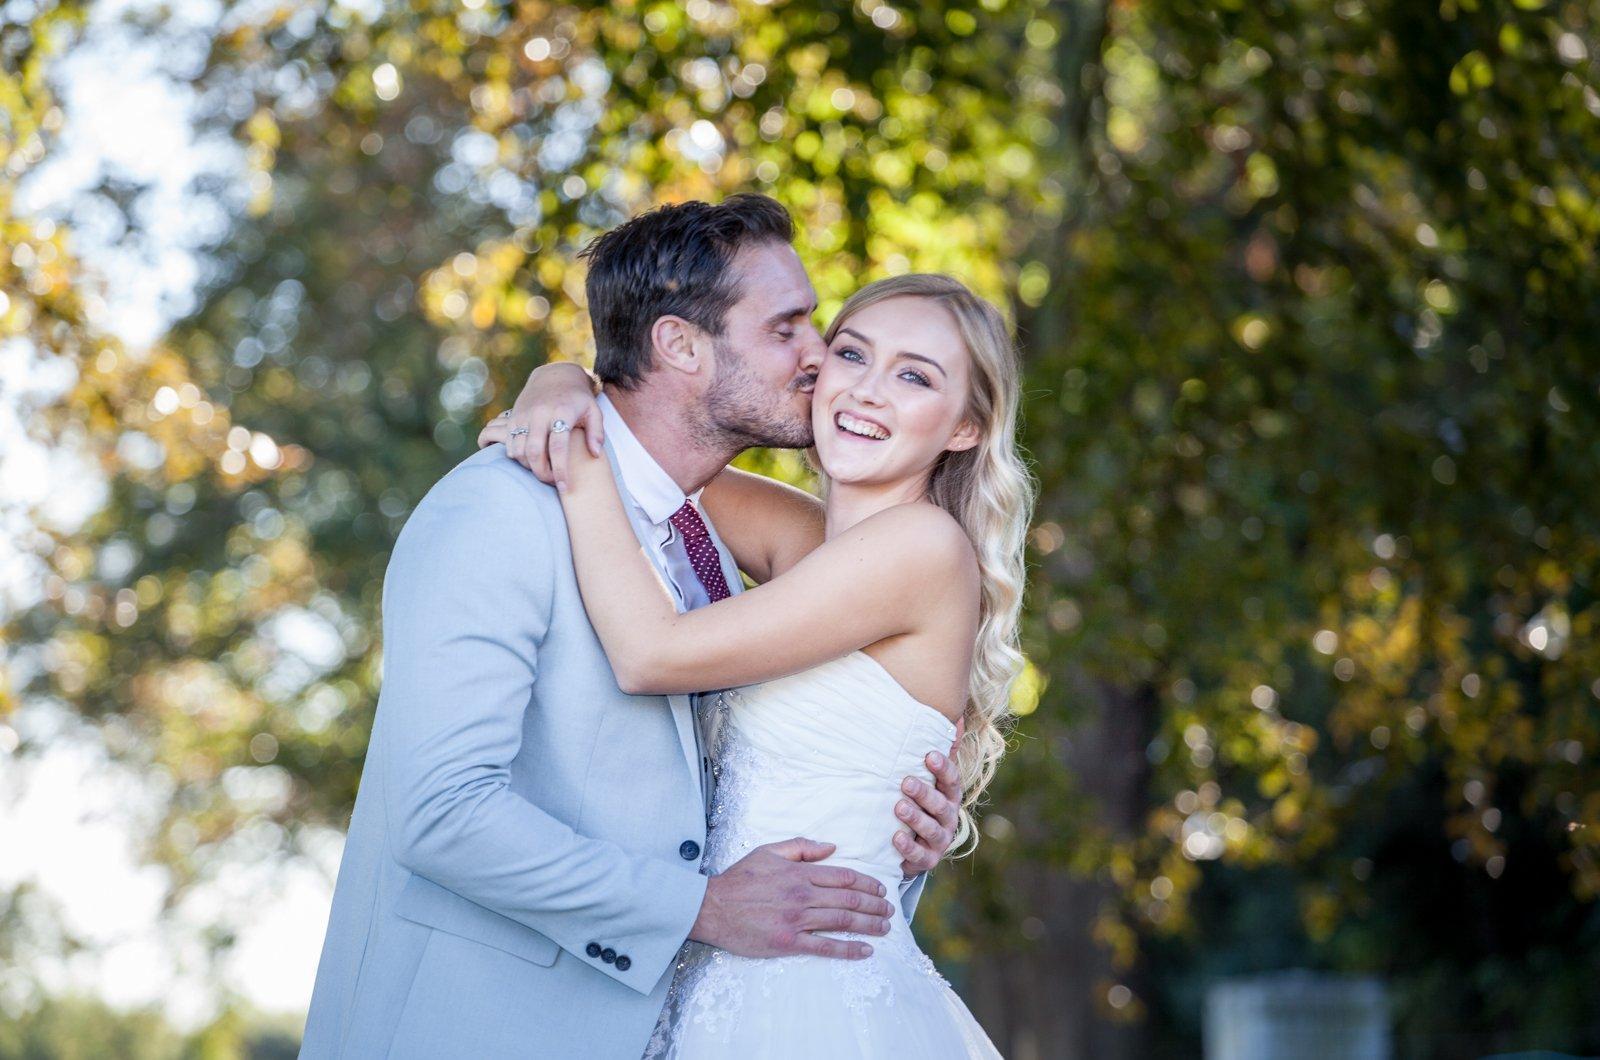 Bride groom kiss wedding photograph